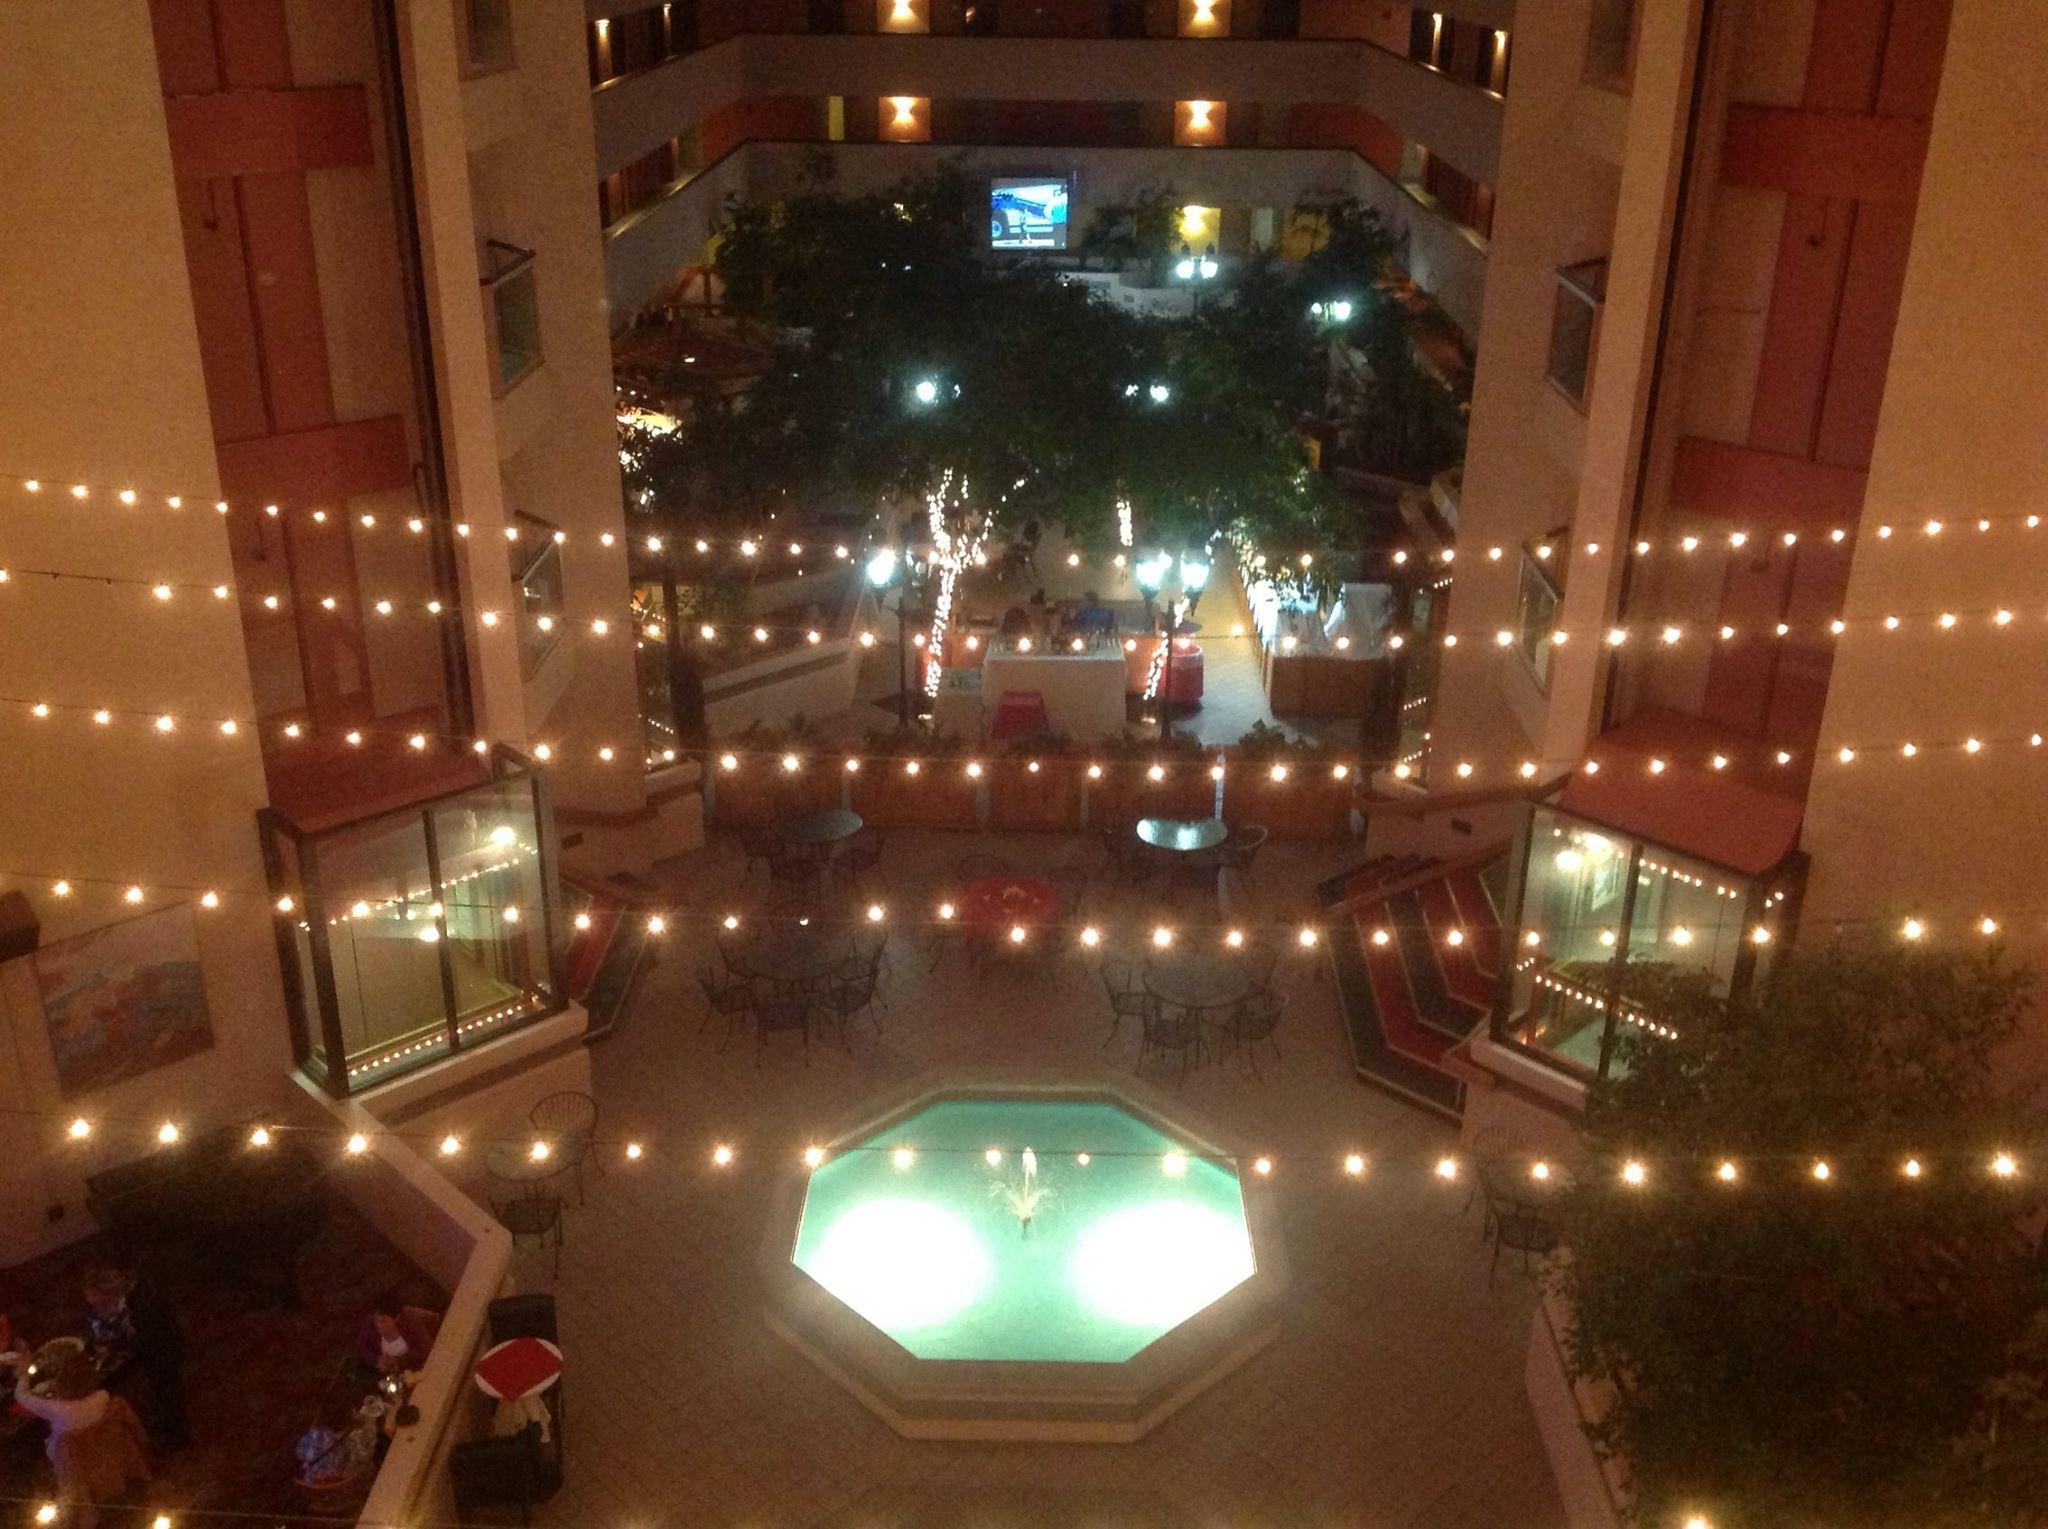 Viscount Suite Hotel image 9